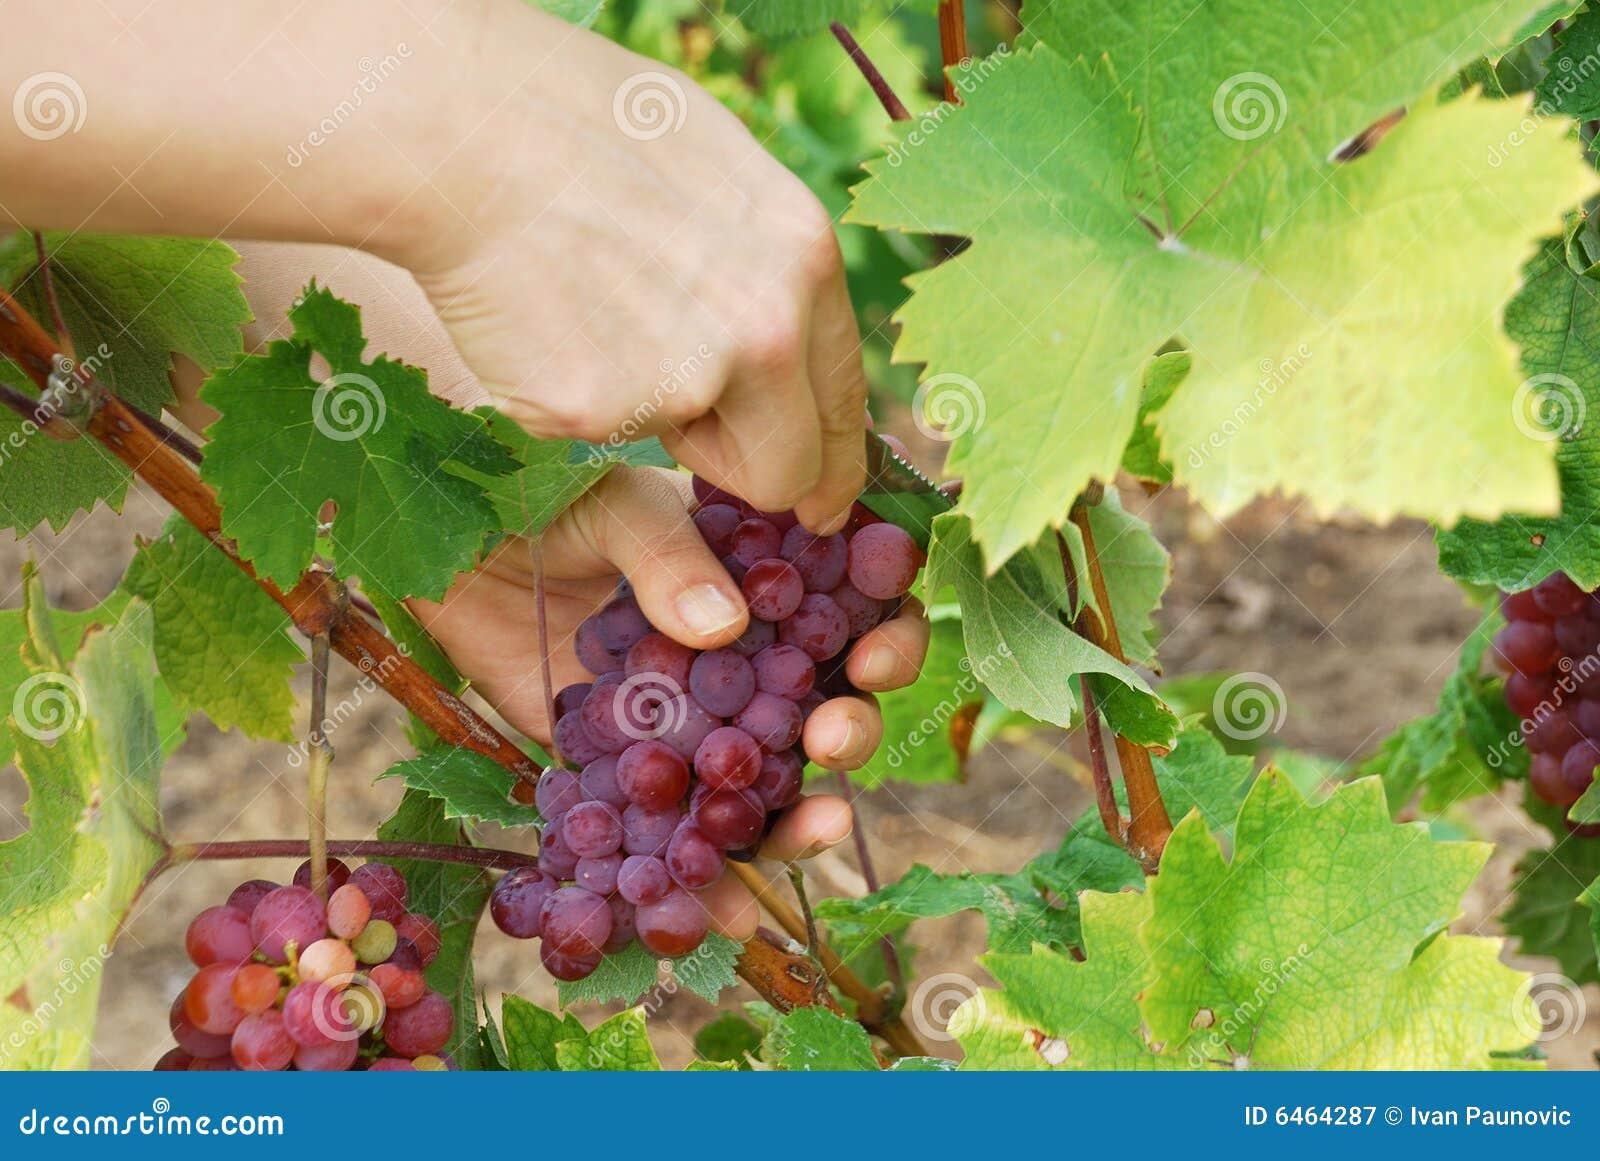 Winogrona zrywania